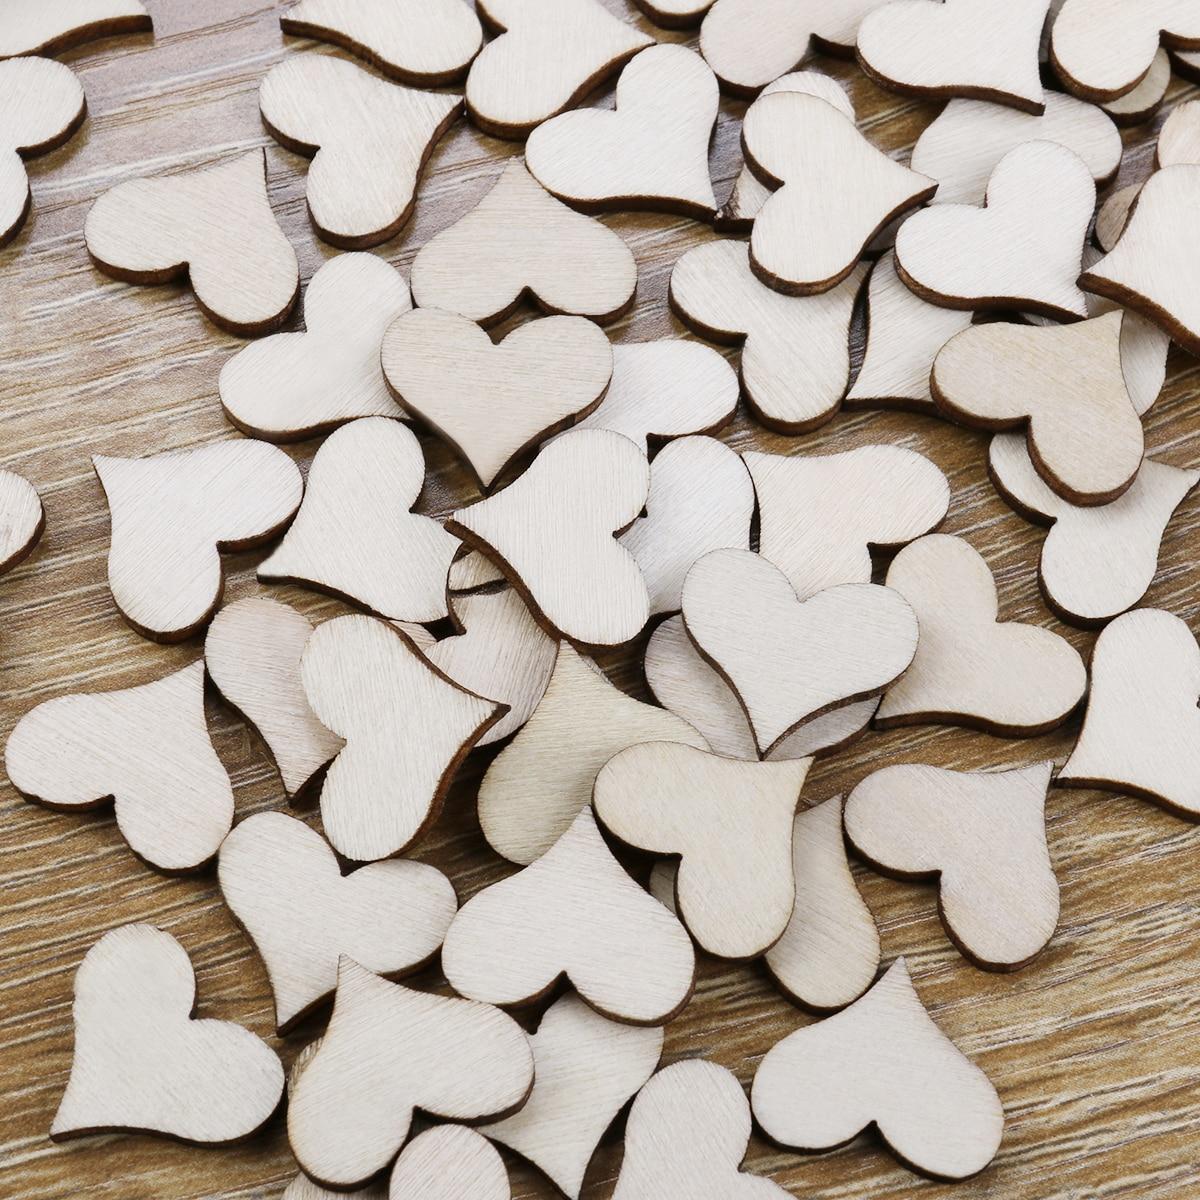 100Pcs DIY Blank Heart Shape Log Pieces Wood Slices Discs Mini ...